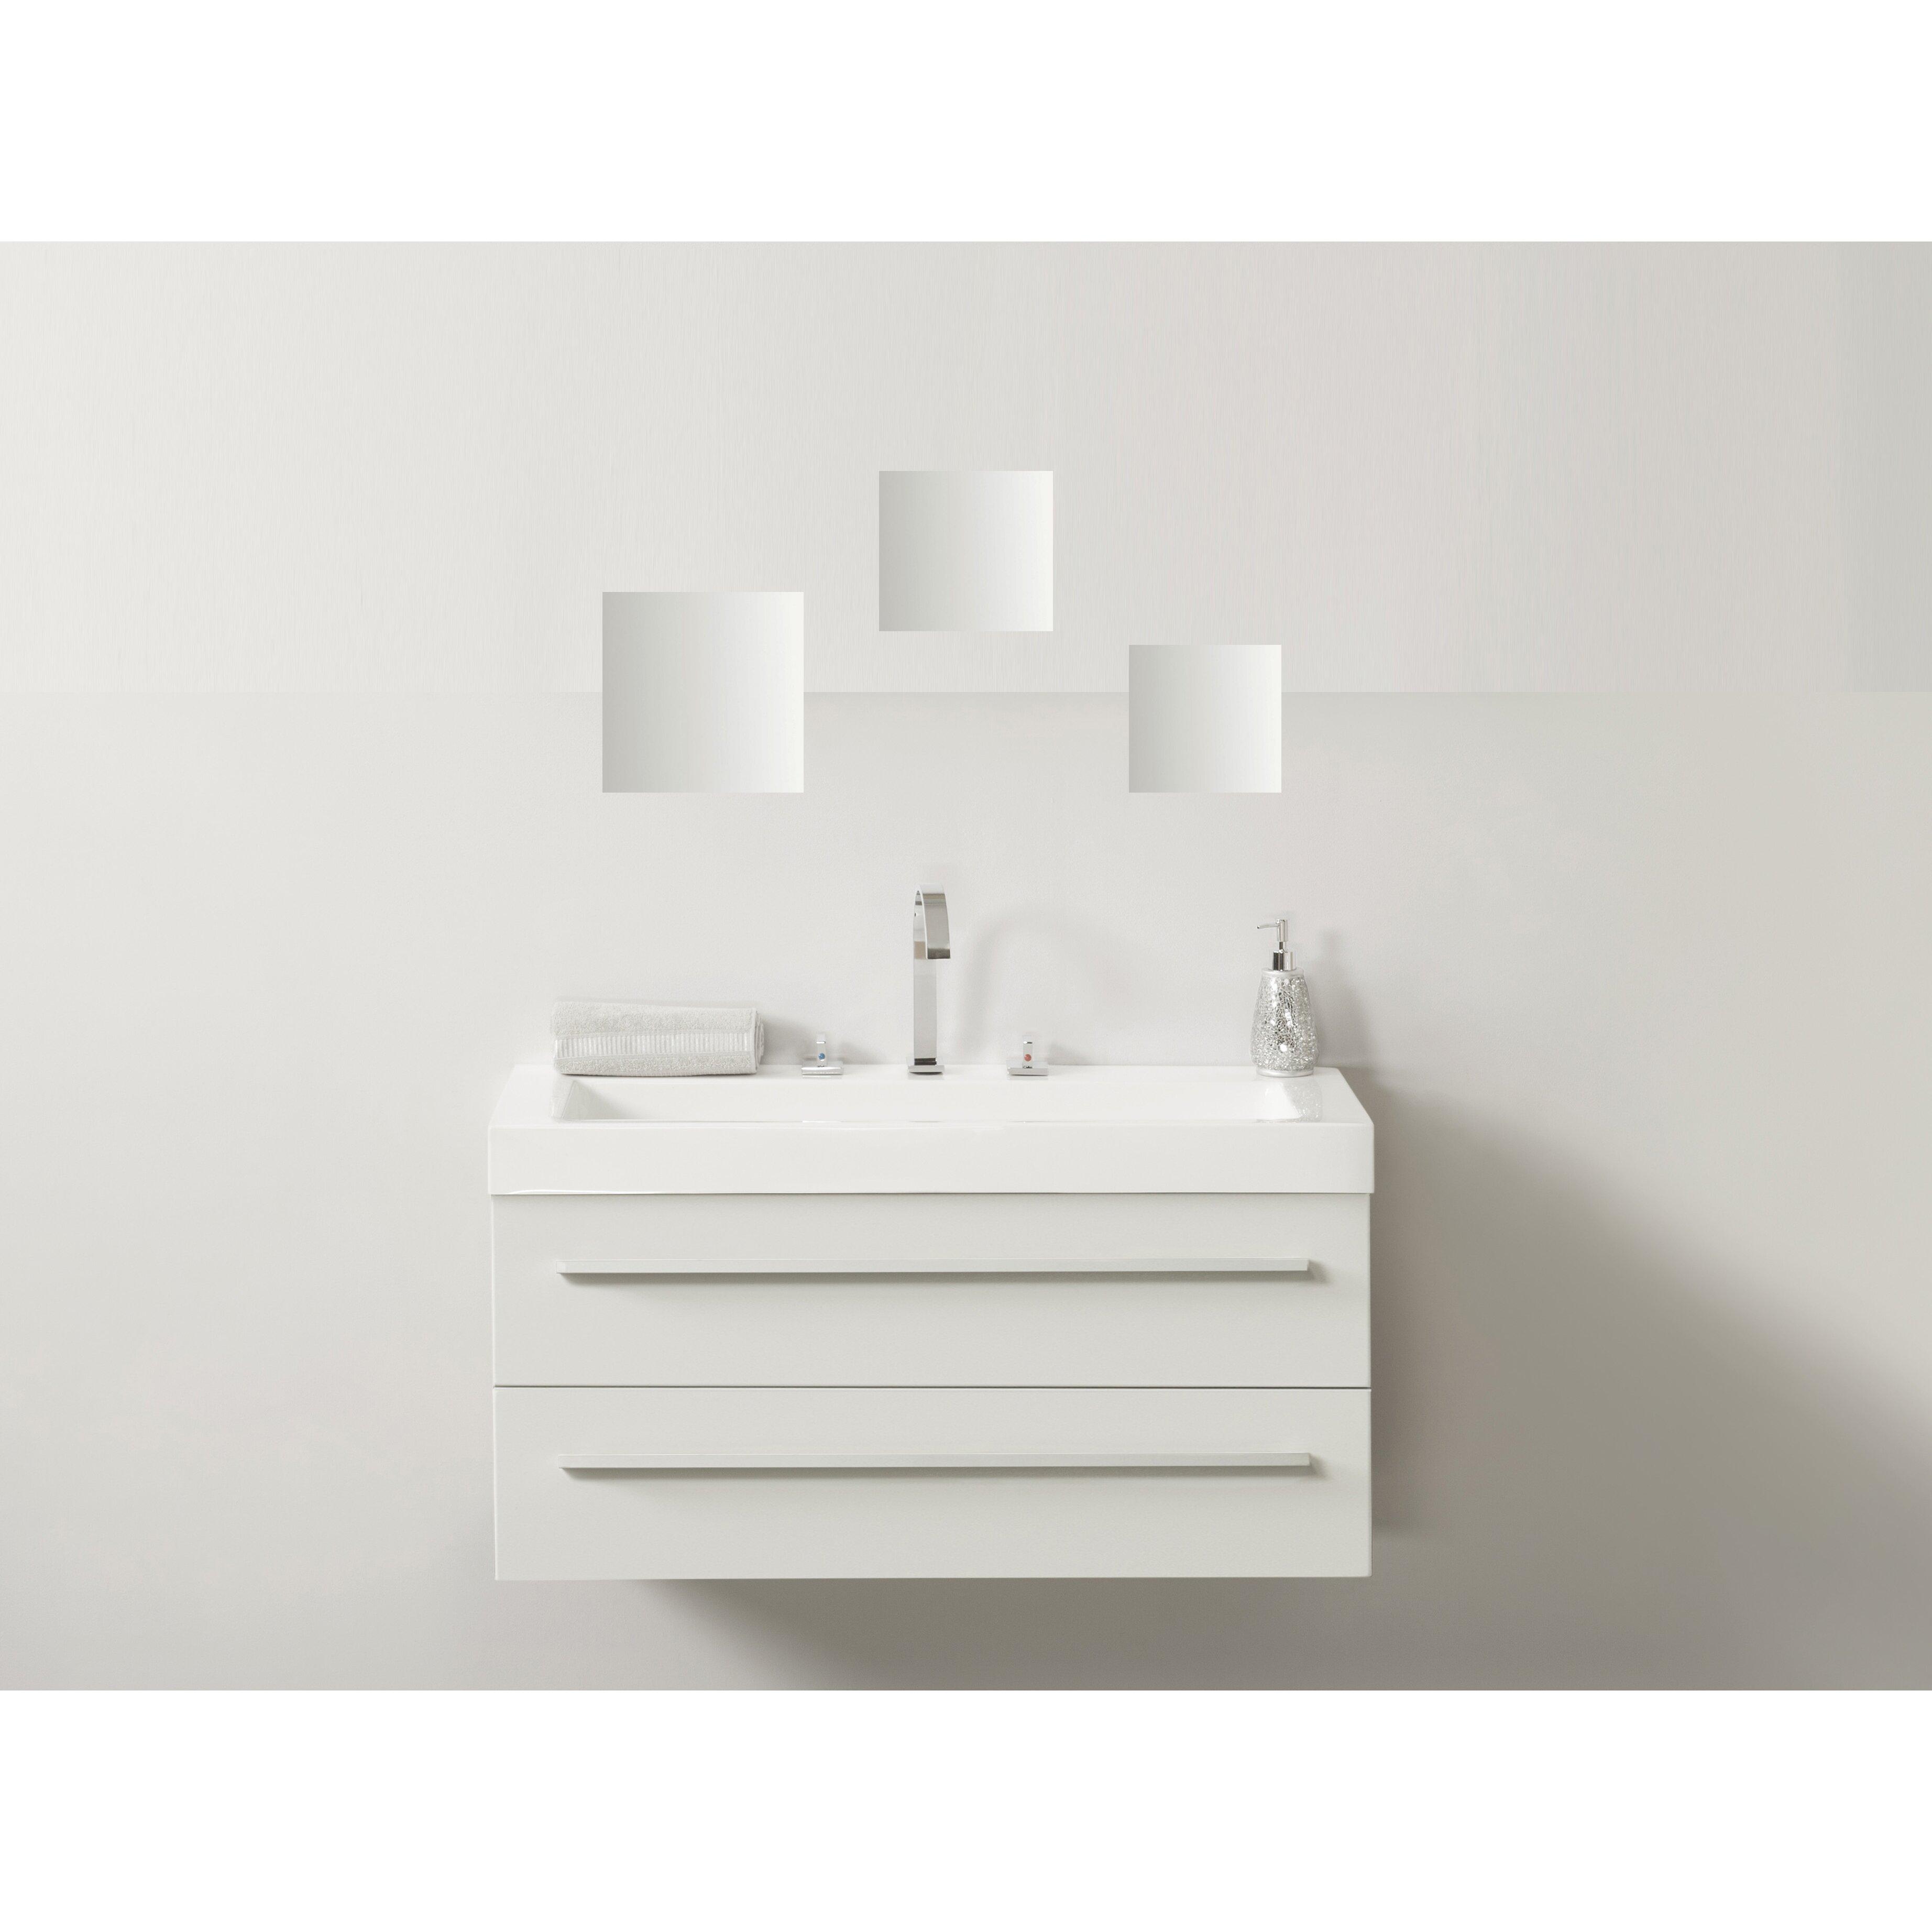 Evideco 3 Piece Decorative Wall Bath Adhesive Square ...